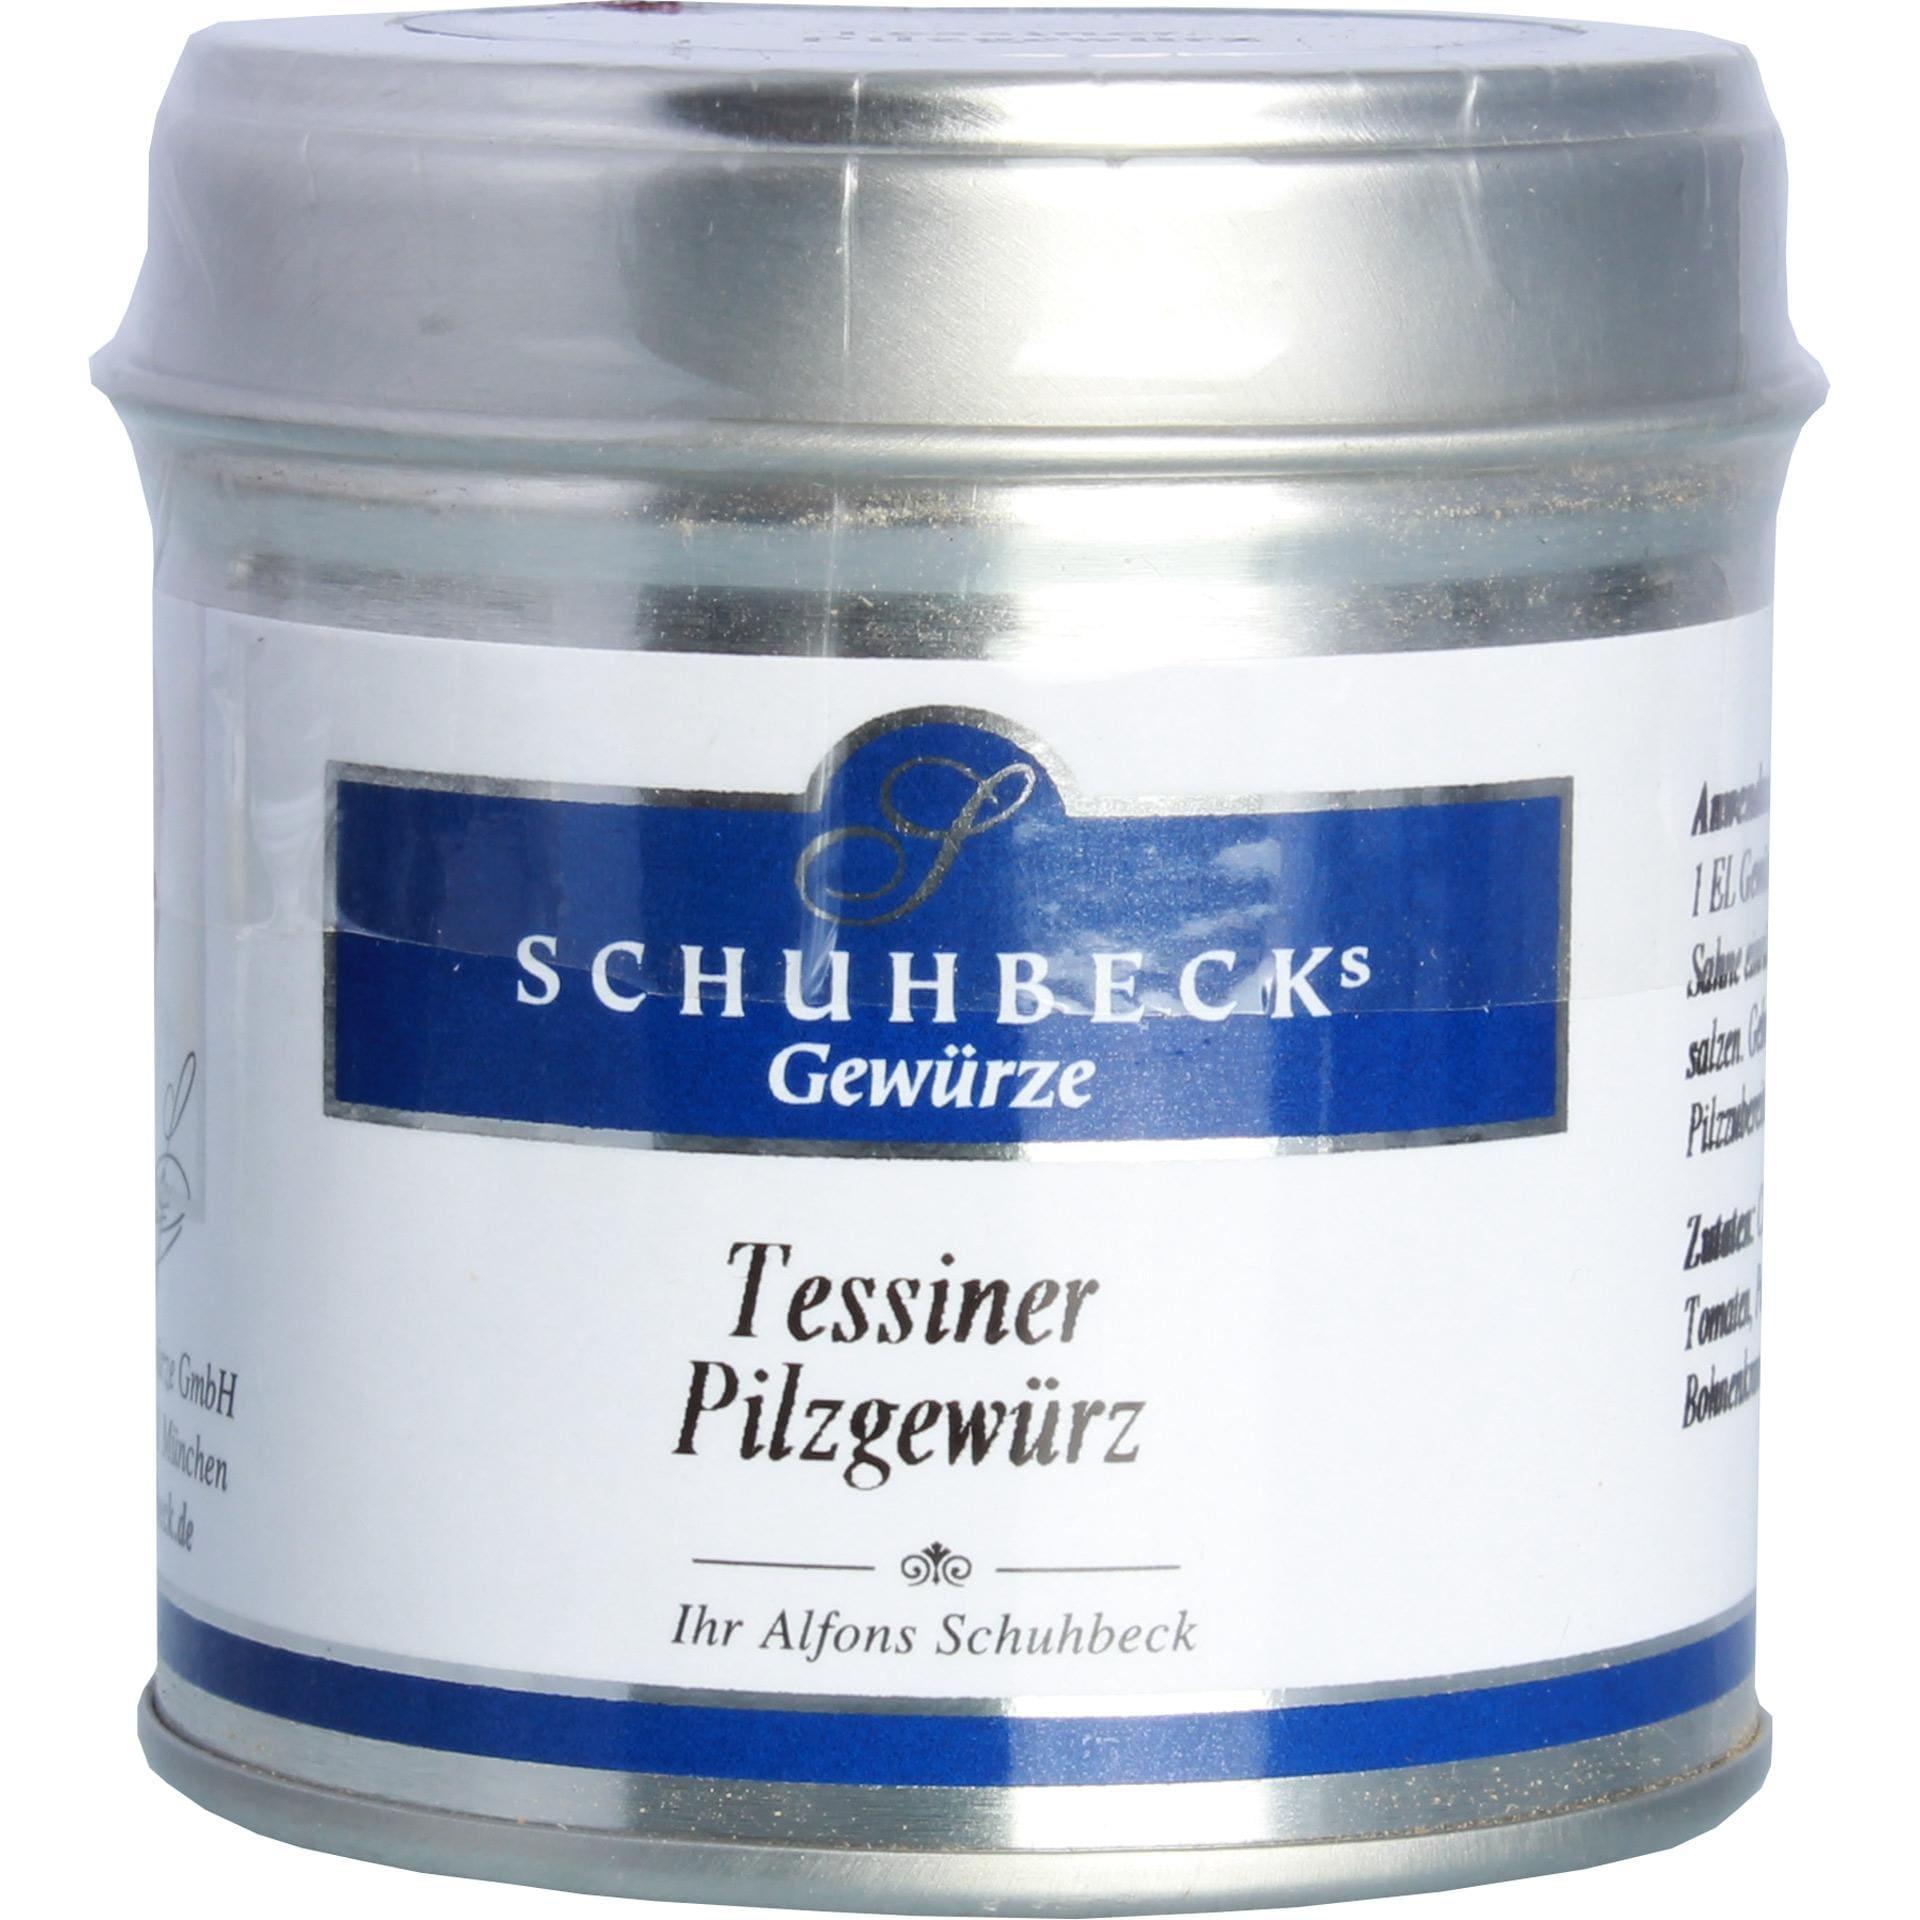 Schuhbeck's Tessiner Pilzgewürz - 45g